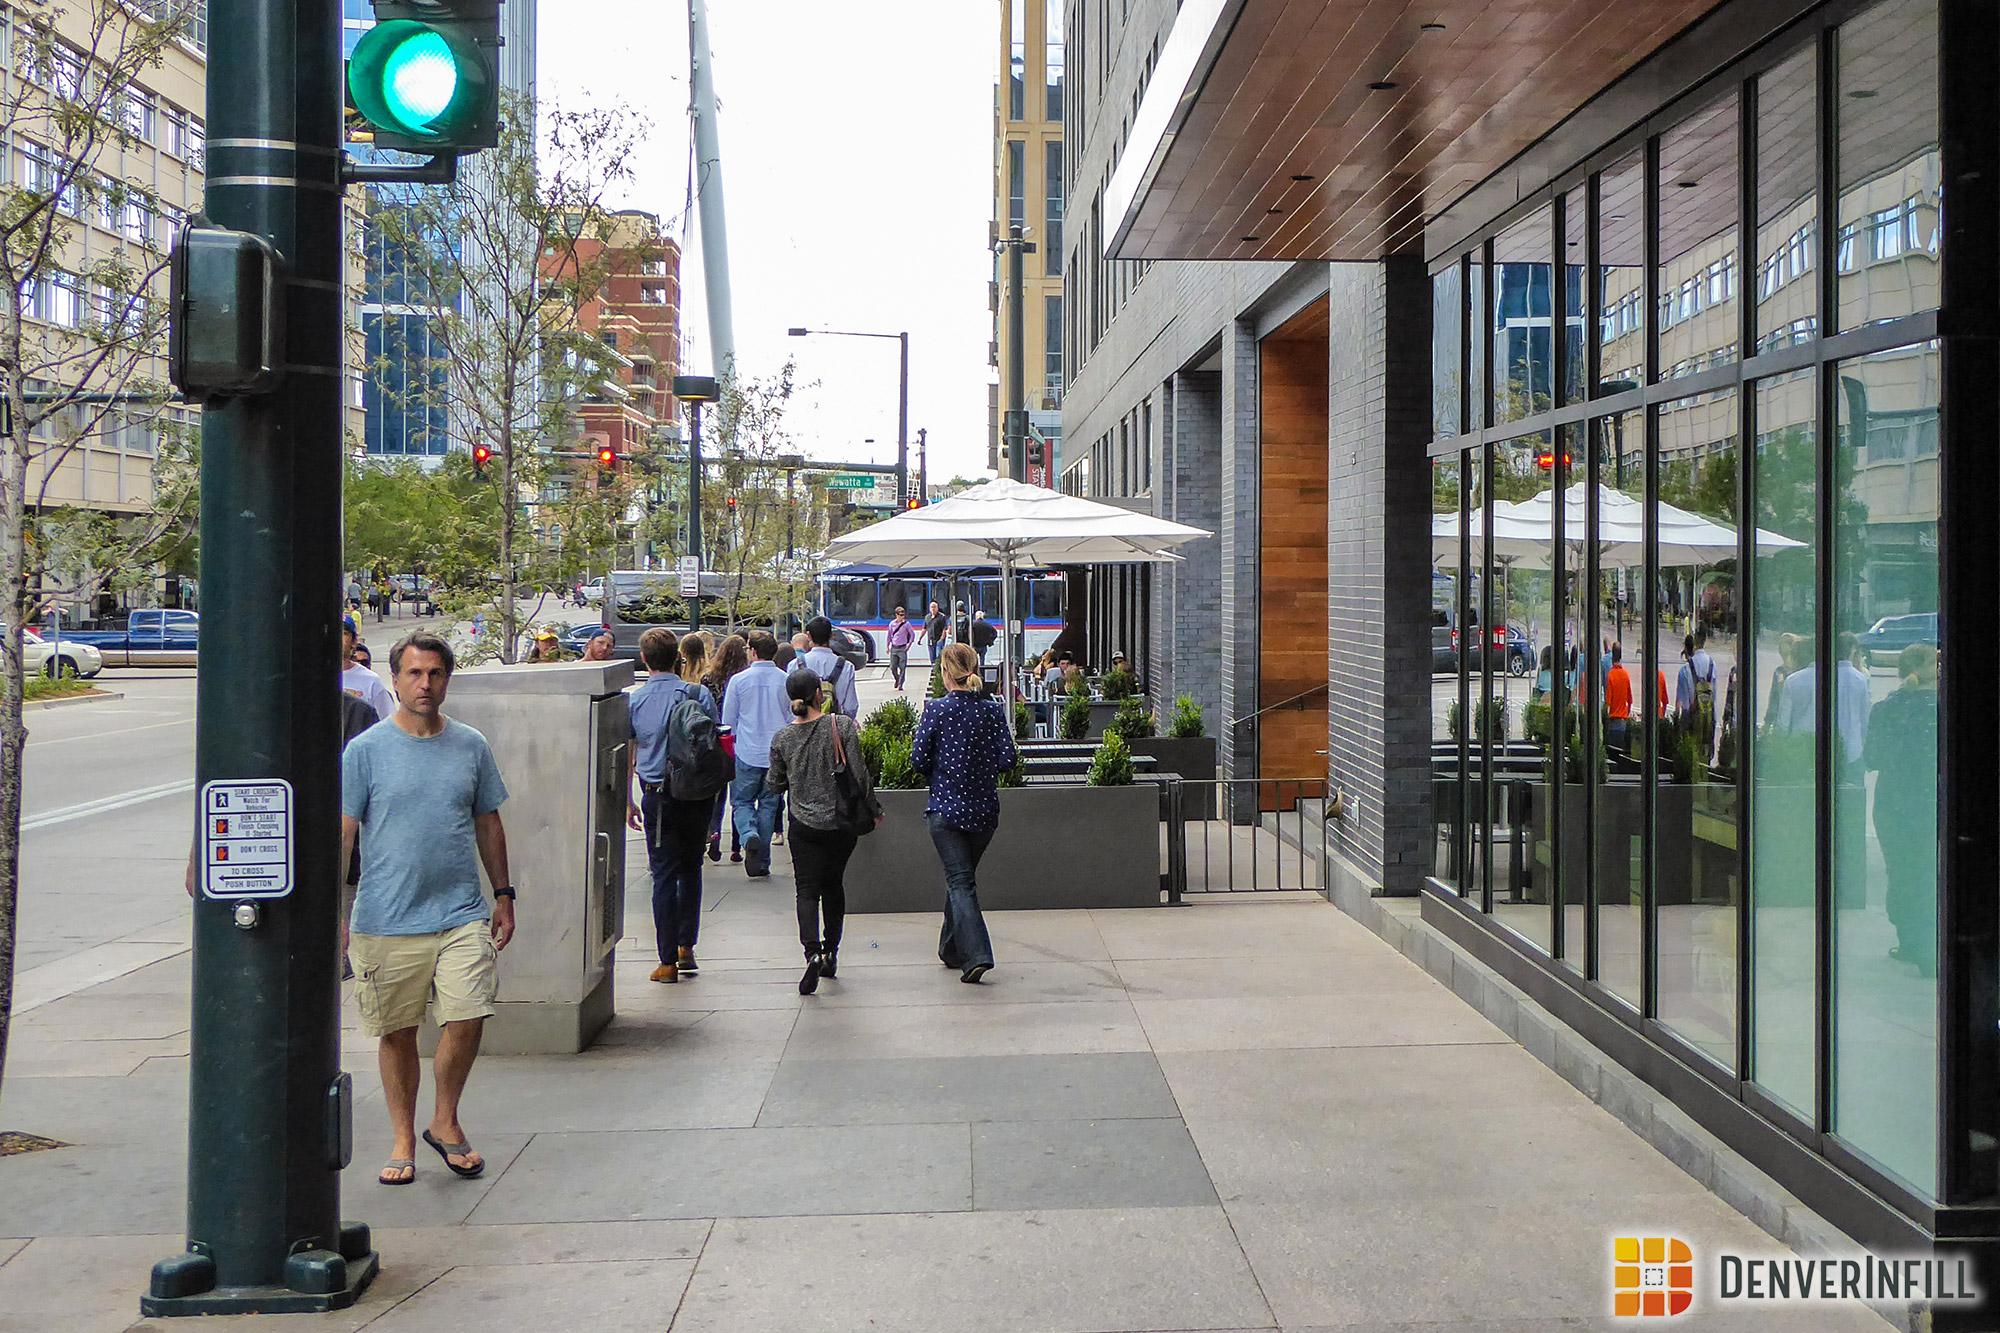 Hotel Born pedestrian frontage along 16th Street